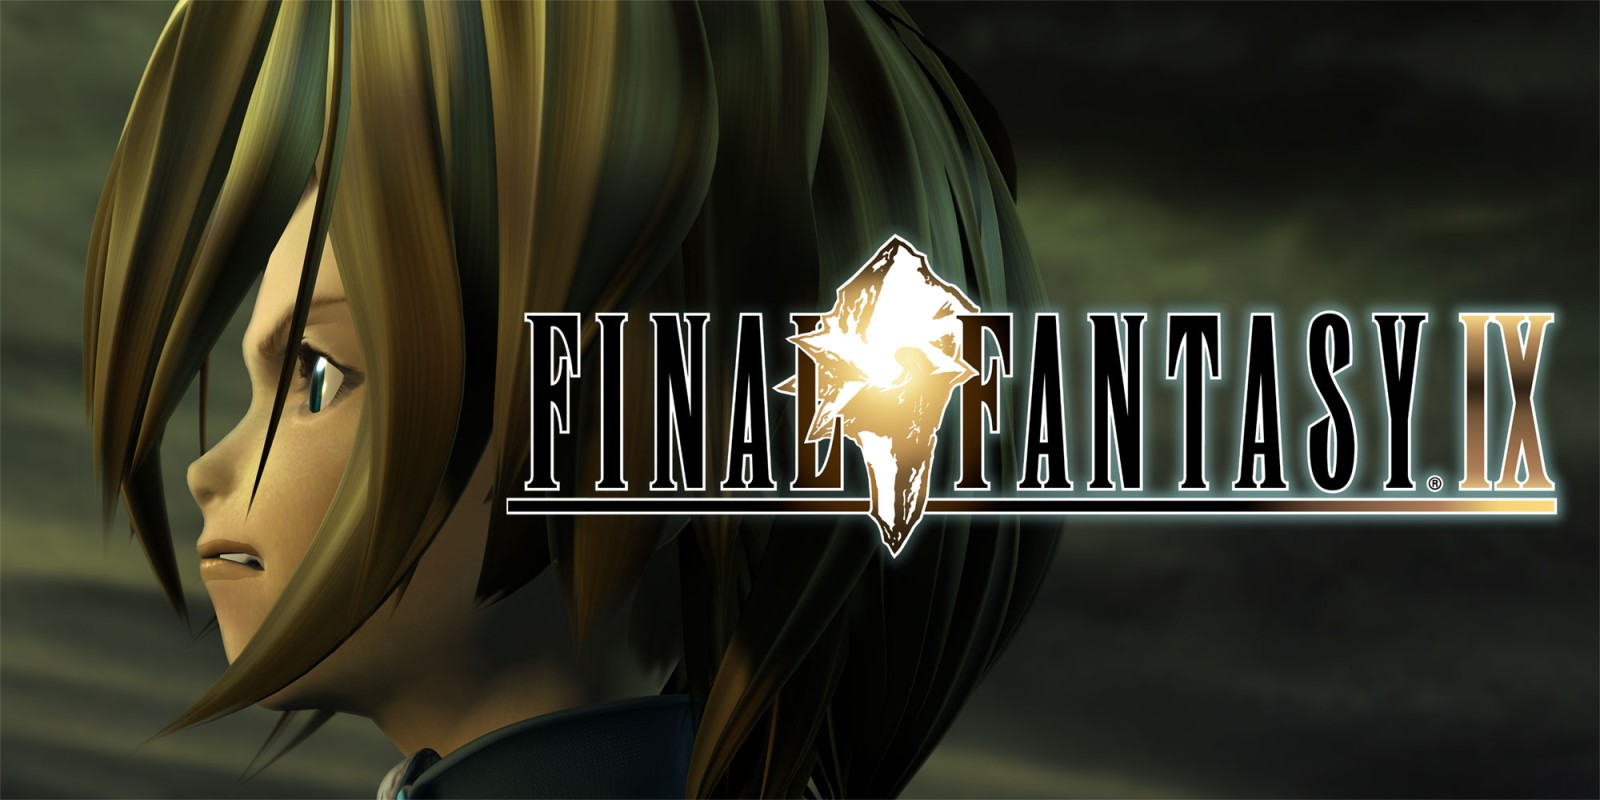 Final fantasy ix транс